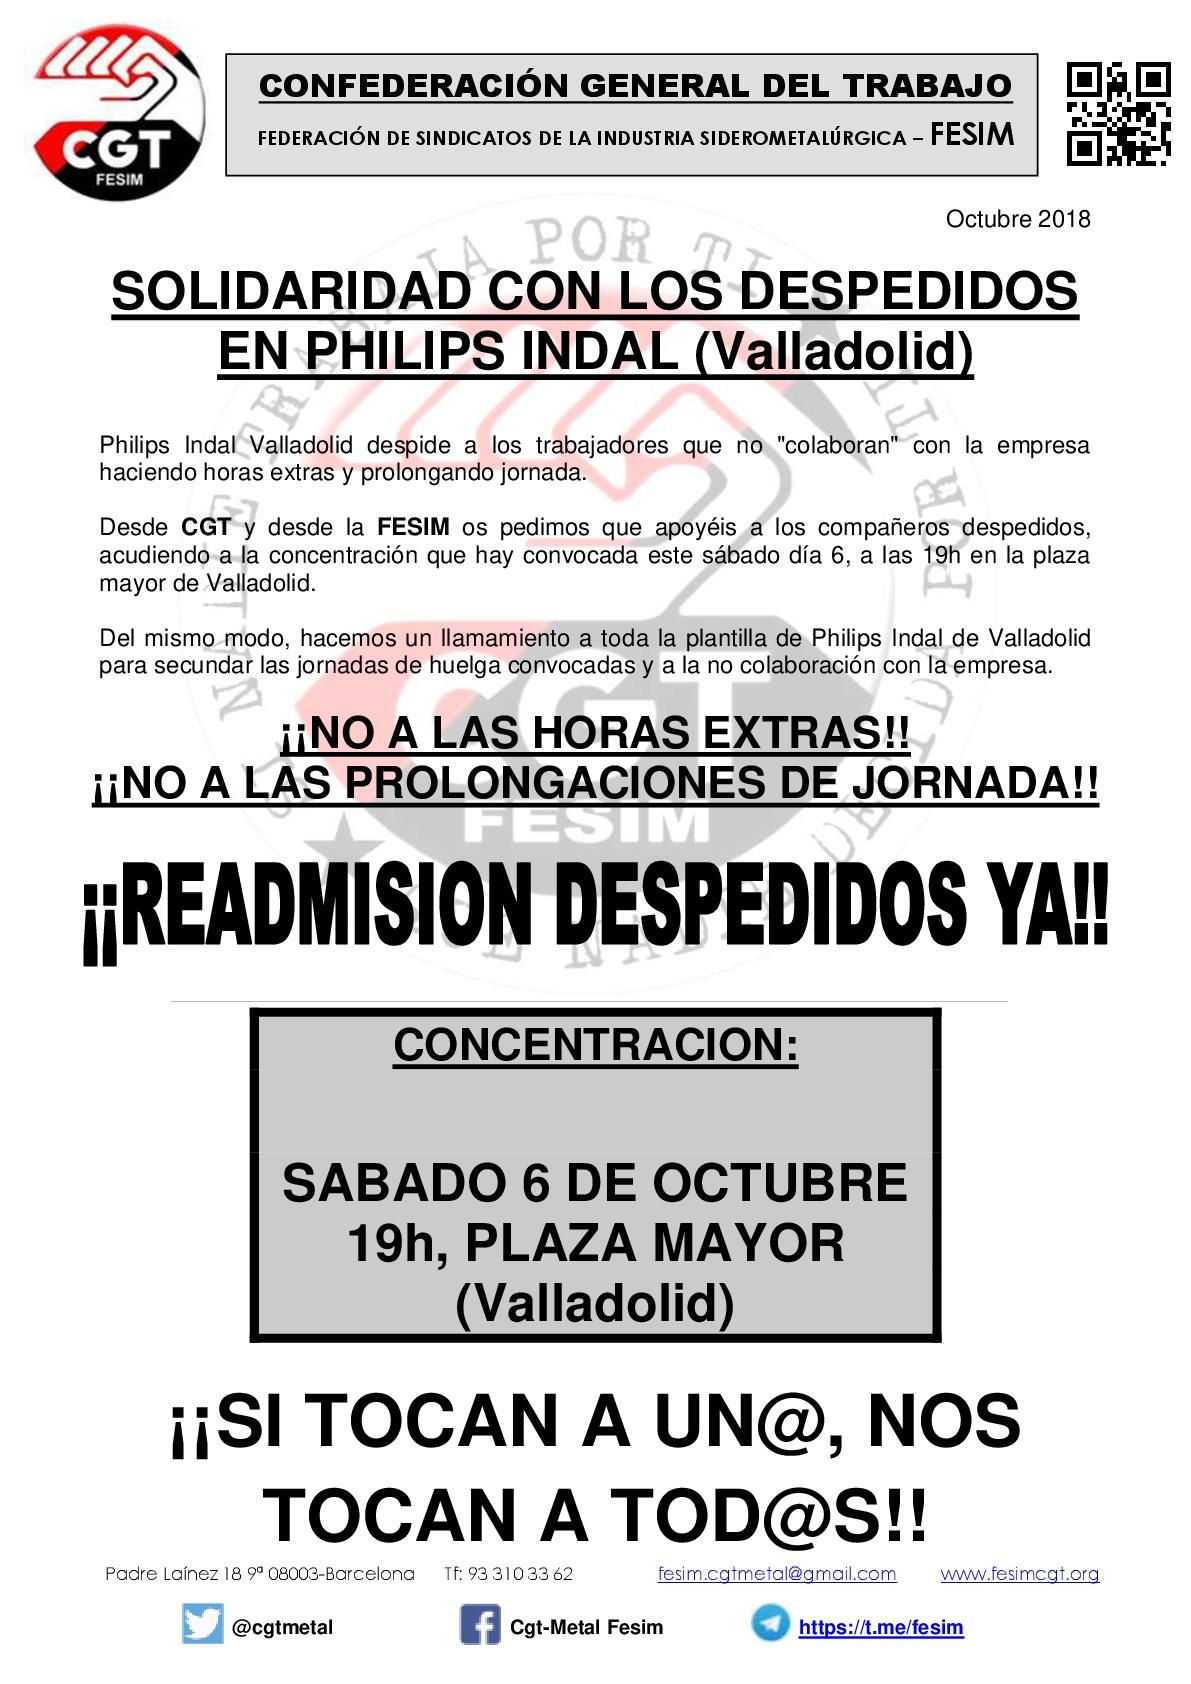 PHILIPS INDAL (Valladolid) despedidos-001(1)